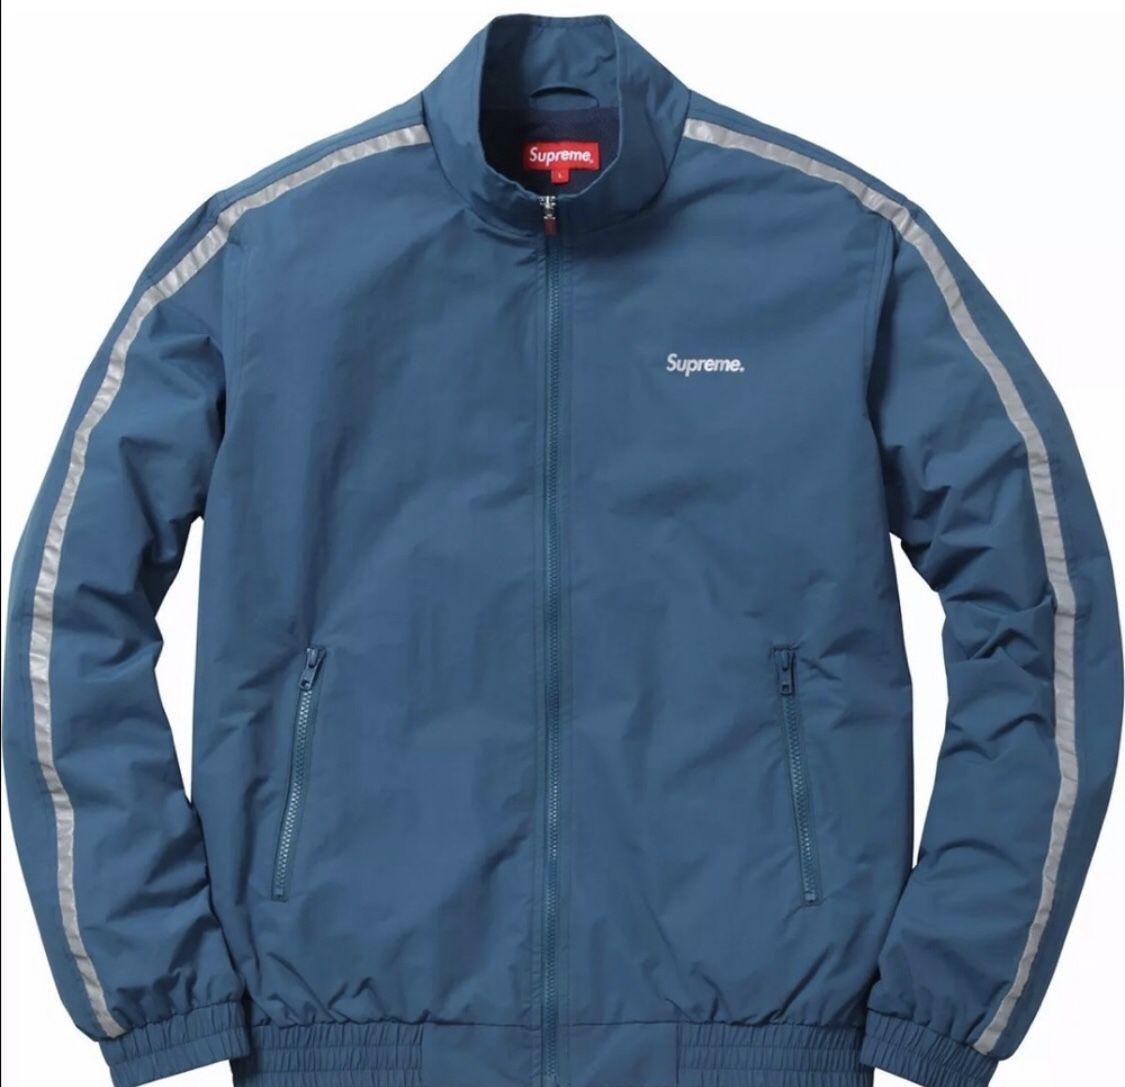 Supreme 3m Reflective Stripe Track Jacket Size M, bag included